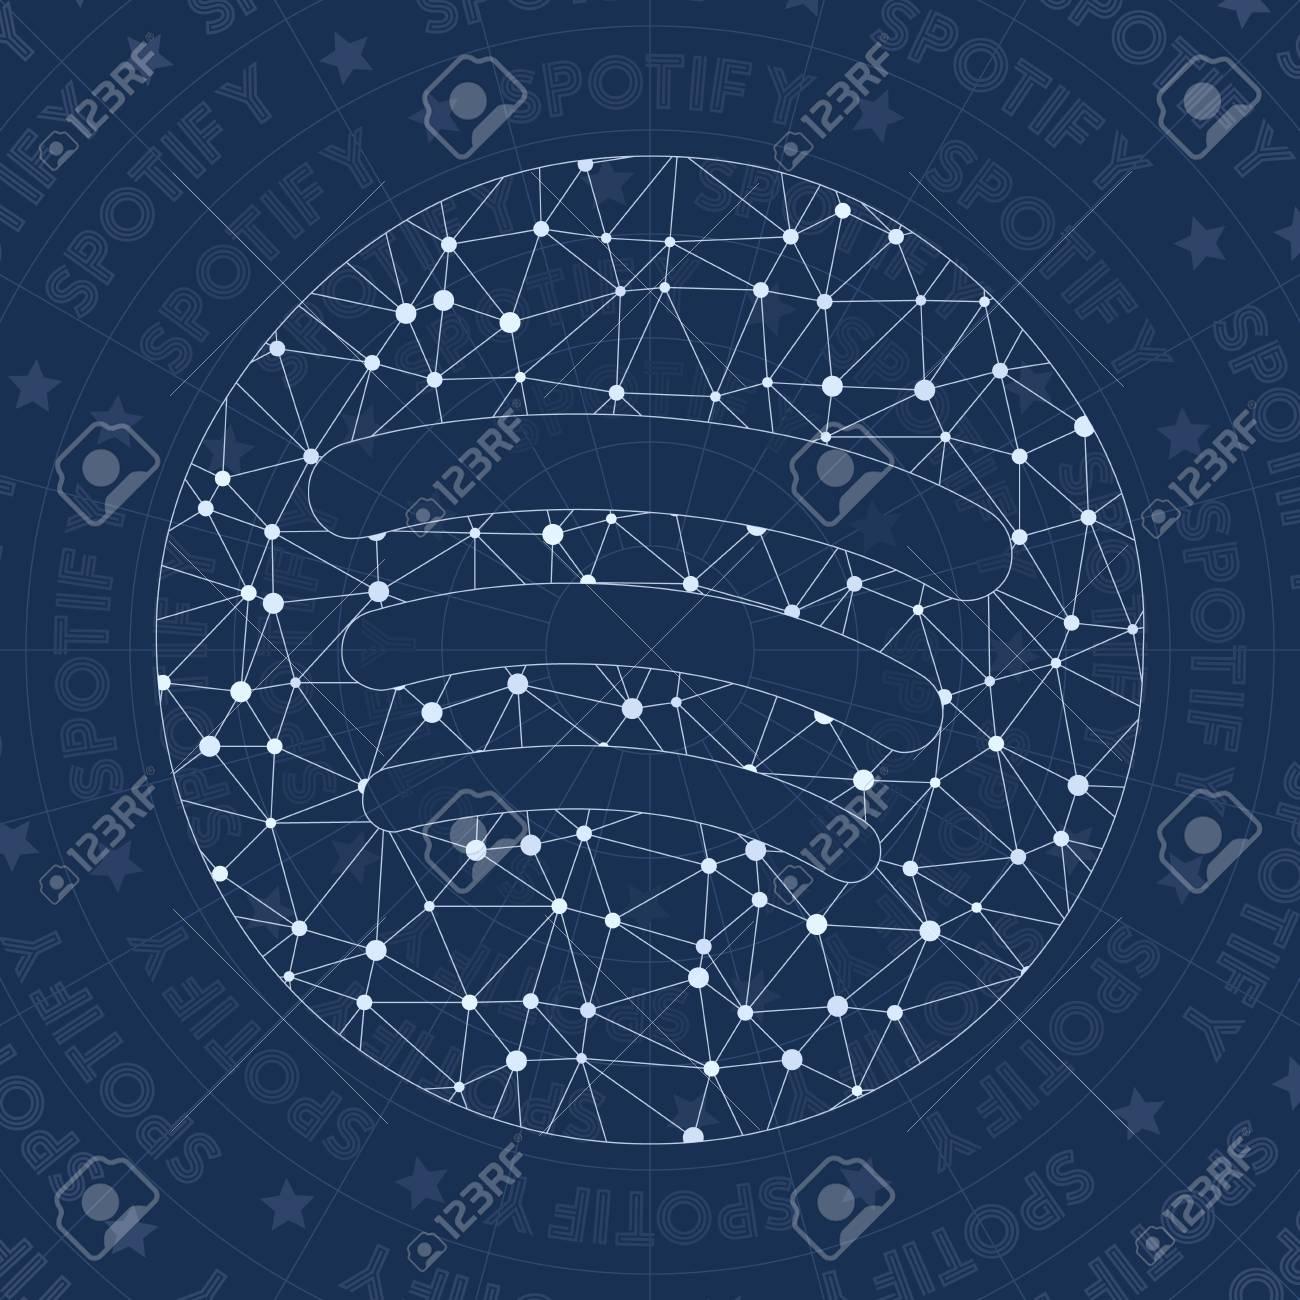 Spotify Network Symbol Amusing Constellation Style Symbol